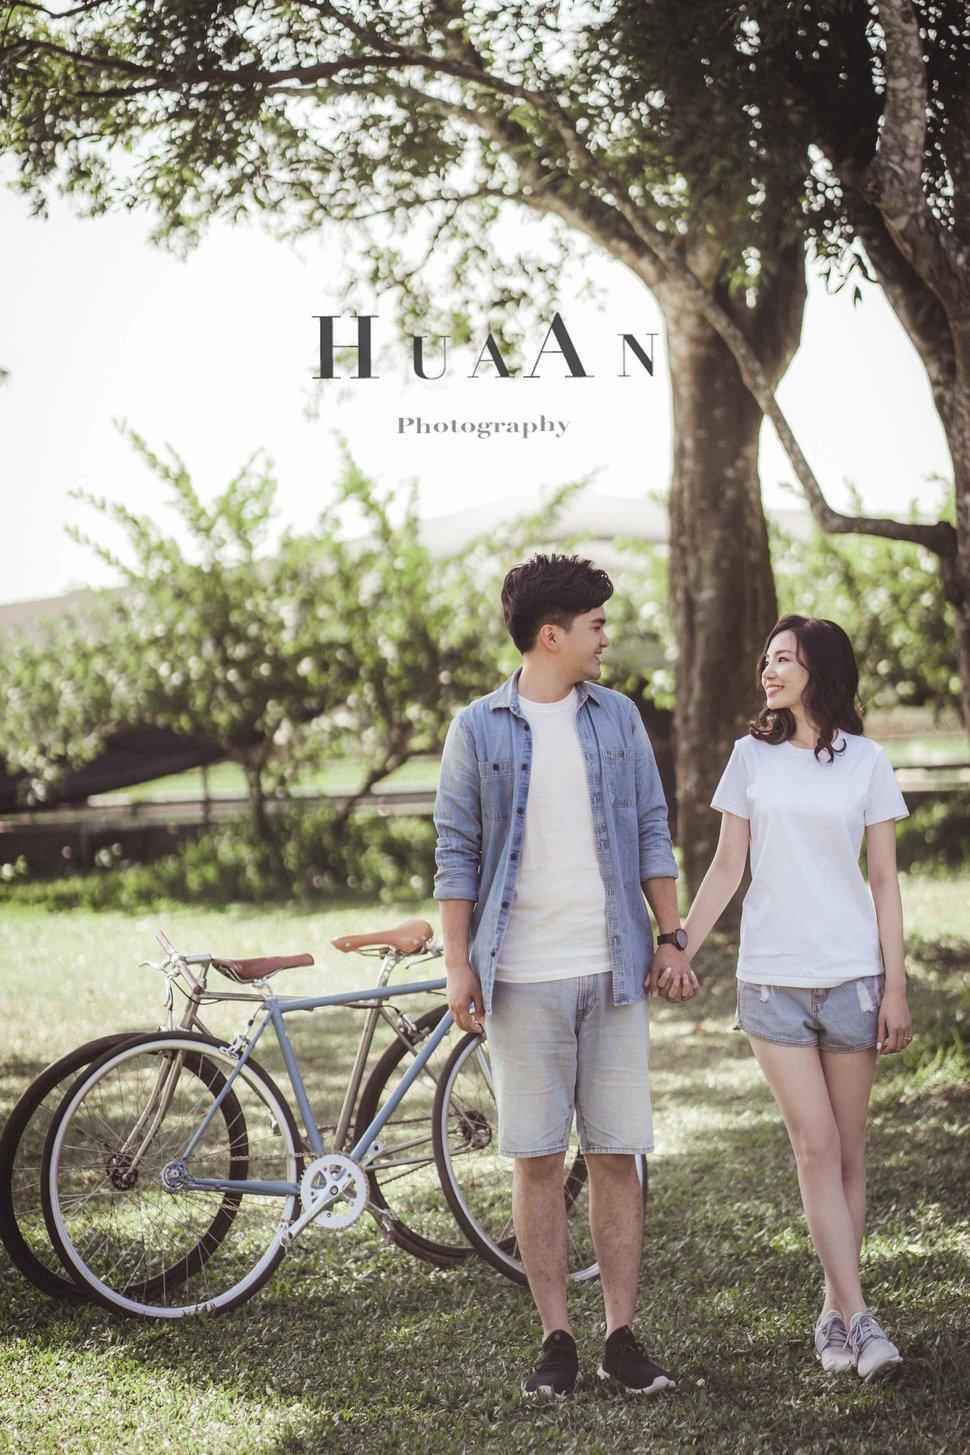 DSC04131 - Huaan Photography《結婚吧》